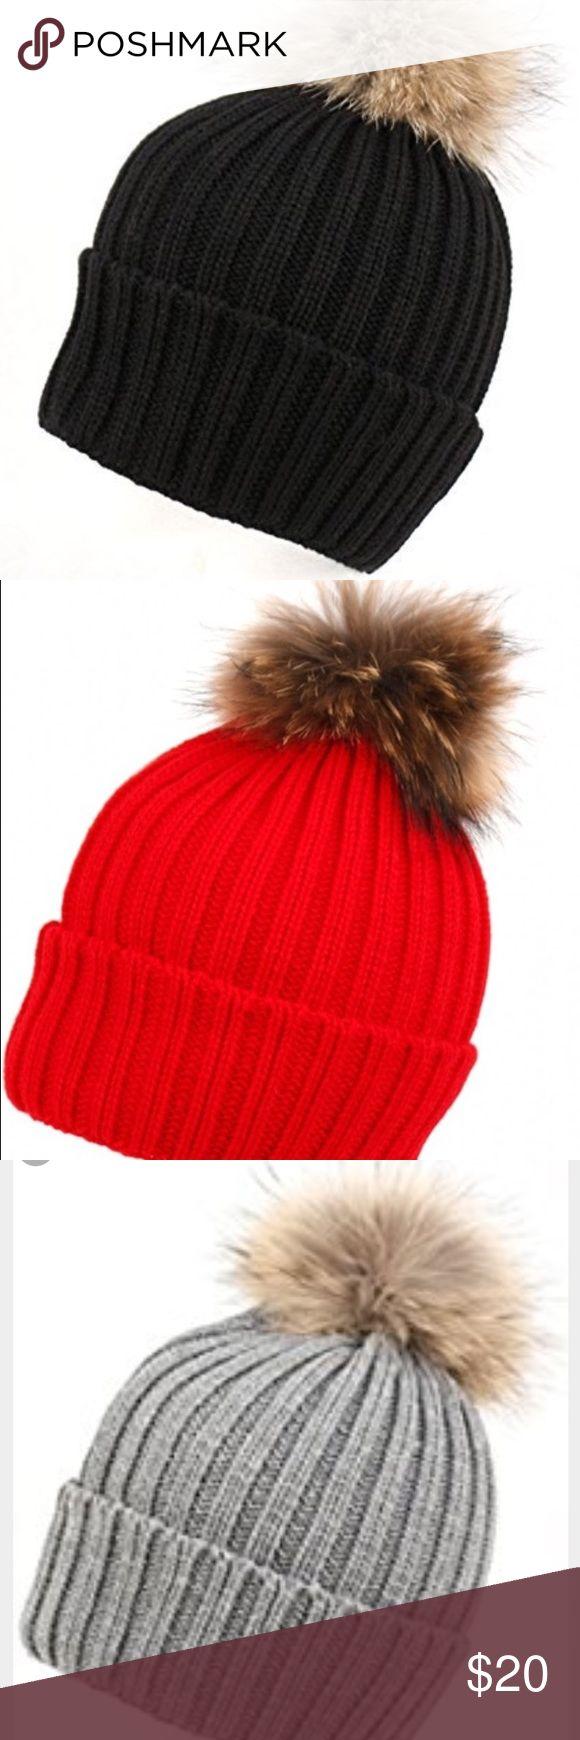 ❄️♀️Warm Fur Pom Pom Knit Hat ✨ Warm, Cable Knit, Raccoon Fur Pom Pom Hats Accessories Hats